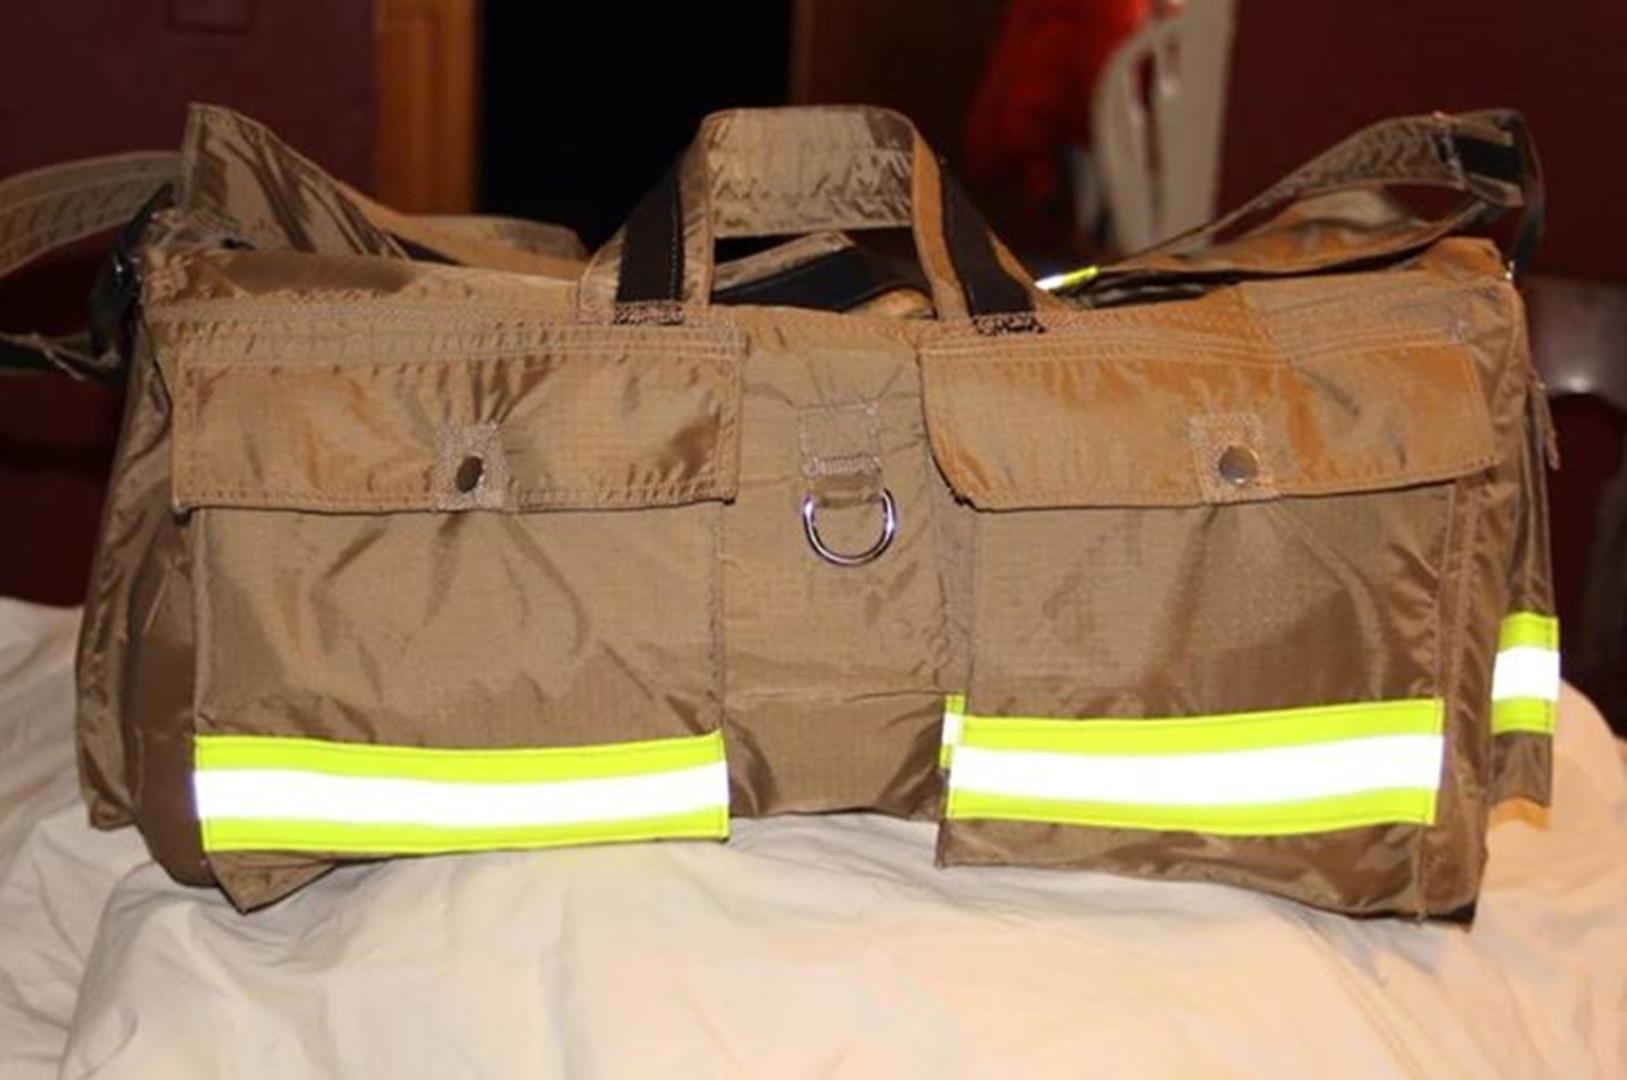 Recycled bunker gear bags - Recycled Bunker Gear Bags 21